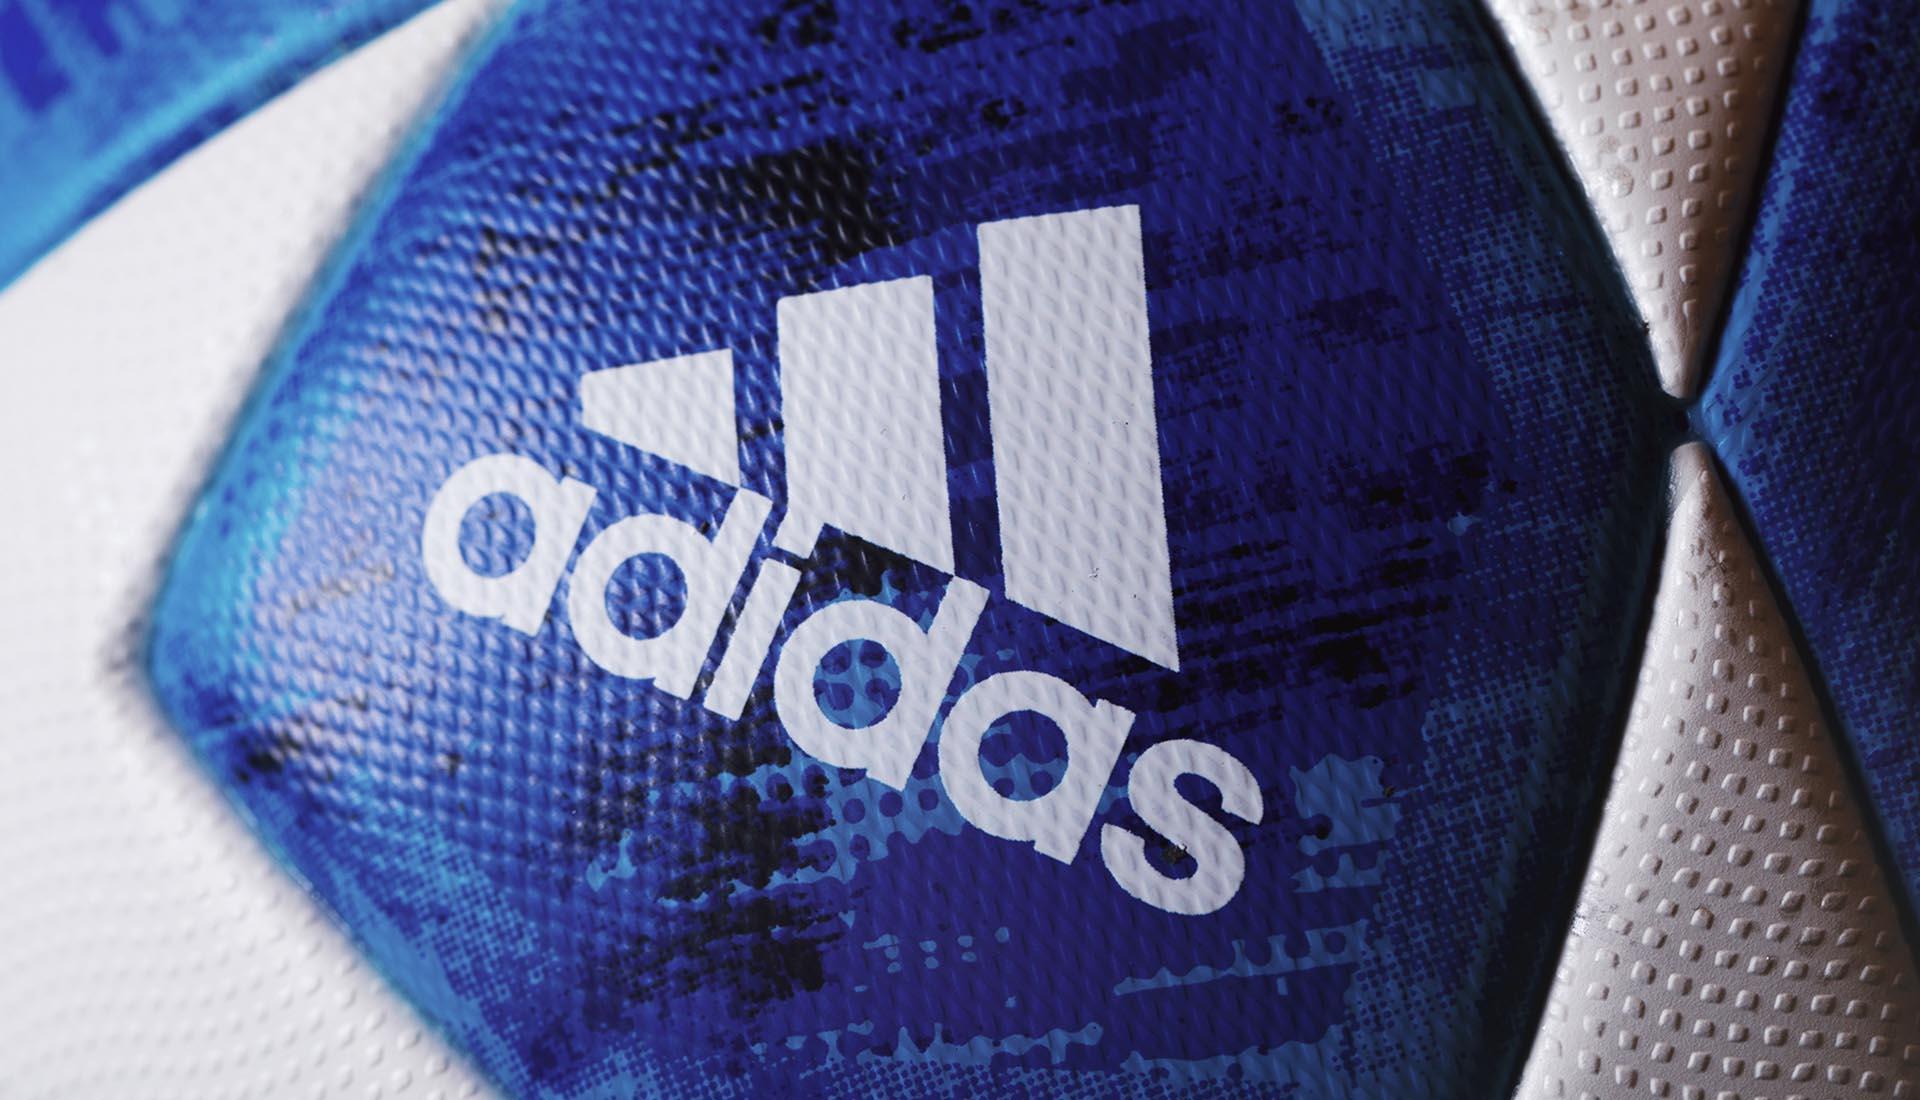 298da081 adidas Release The 2018/19 Champions League Official Match Ball ...